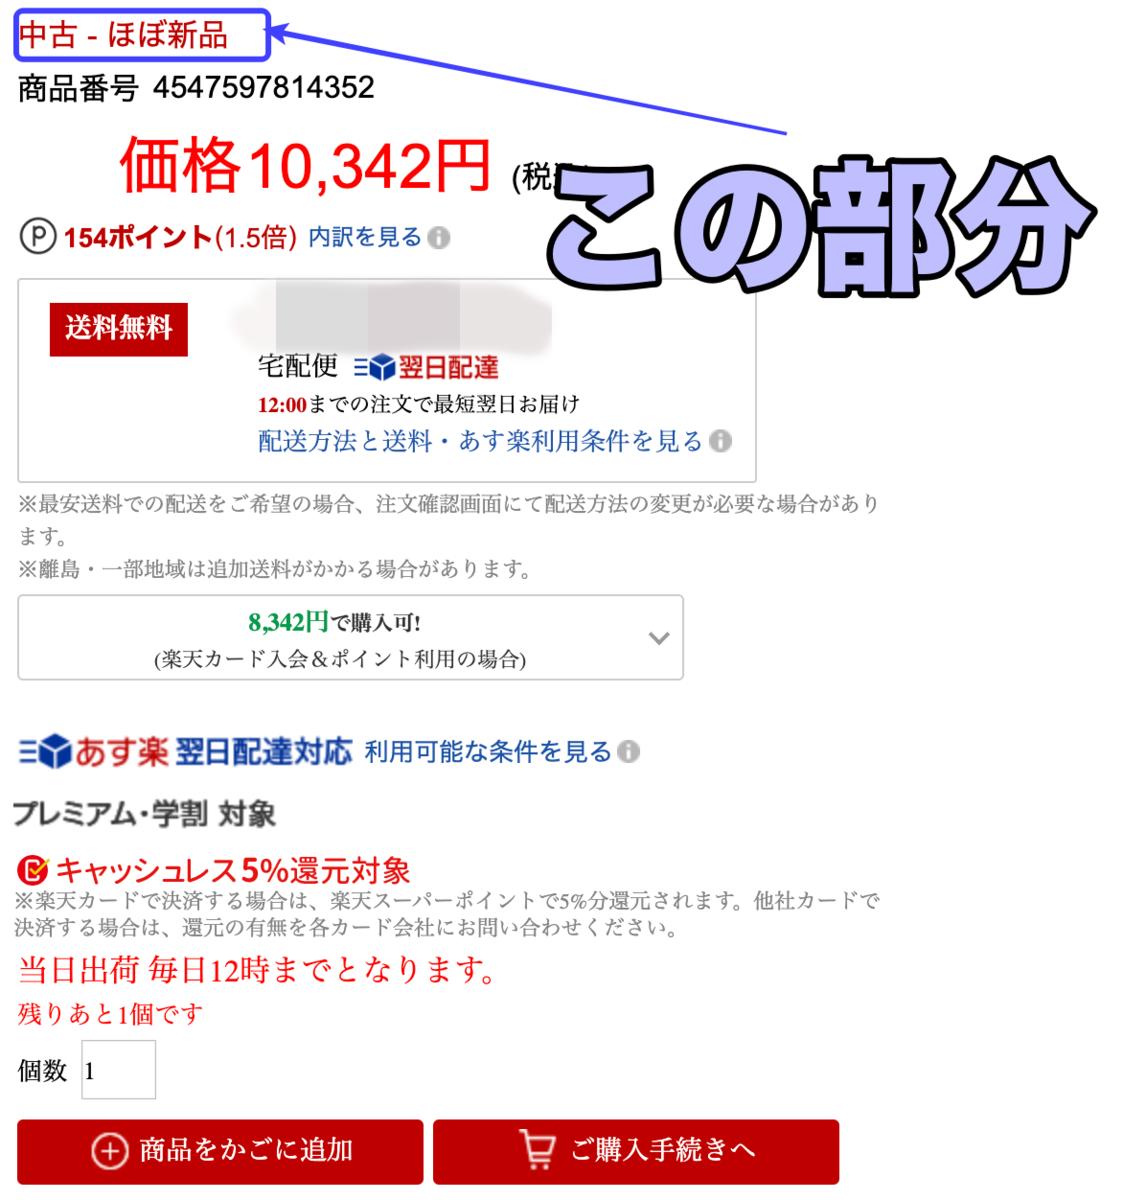 f:id:ebaysearteacher:20191022171635p:plain